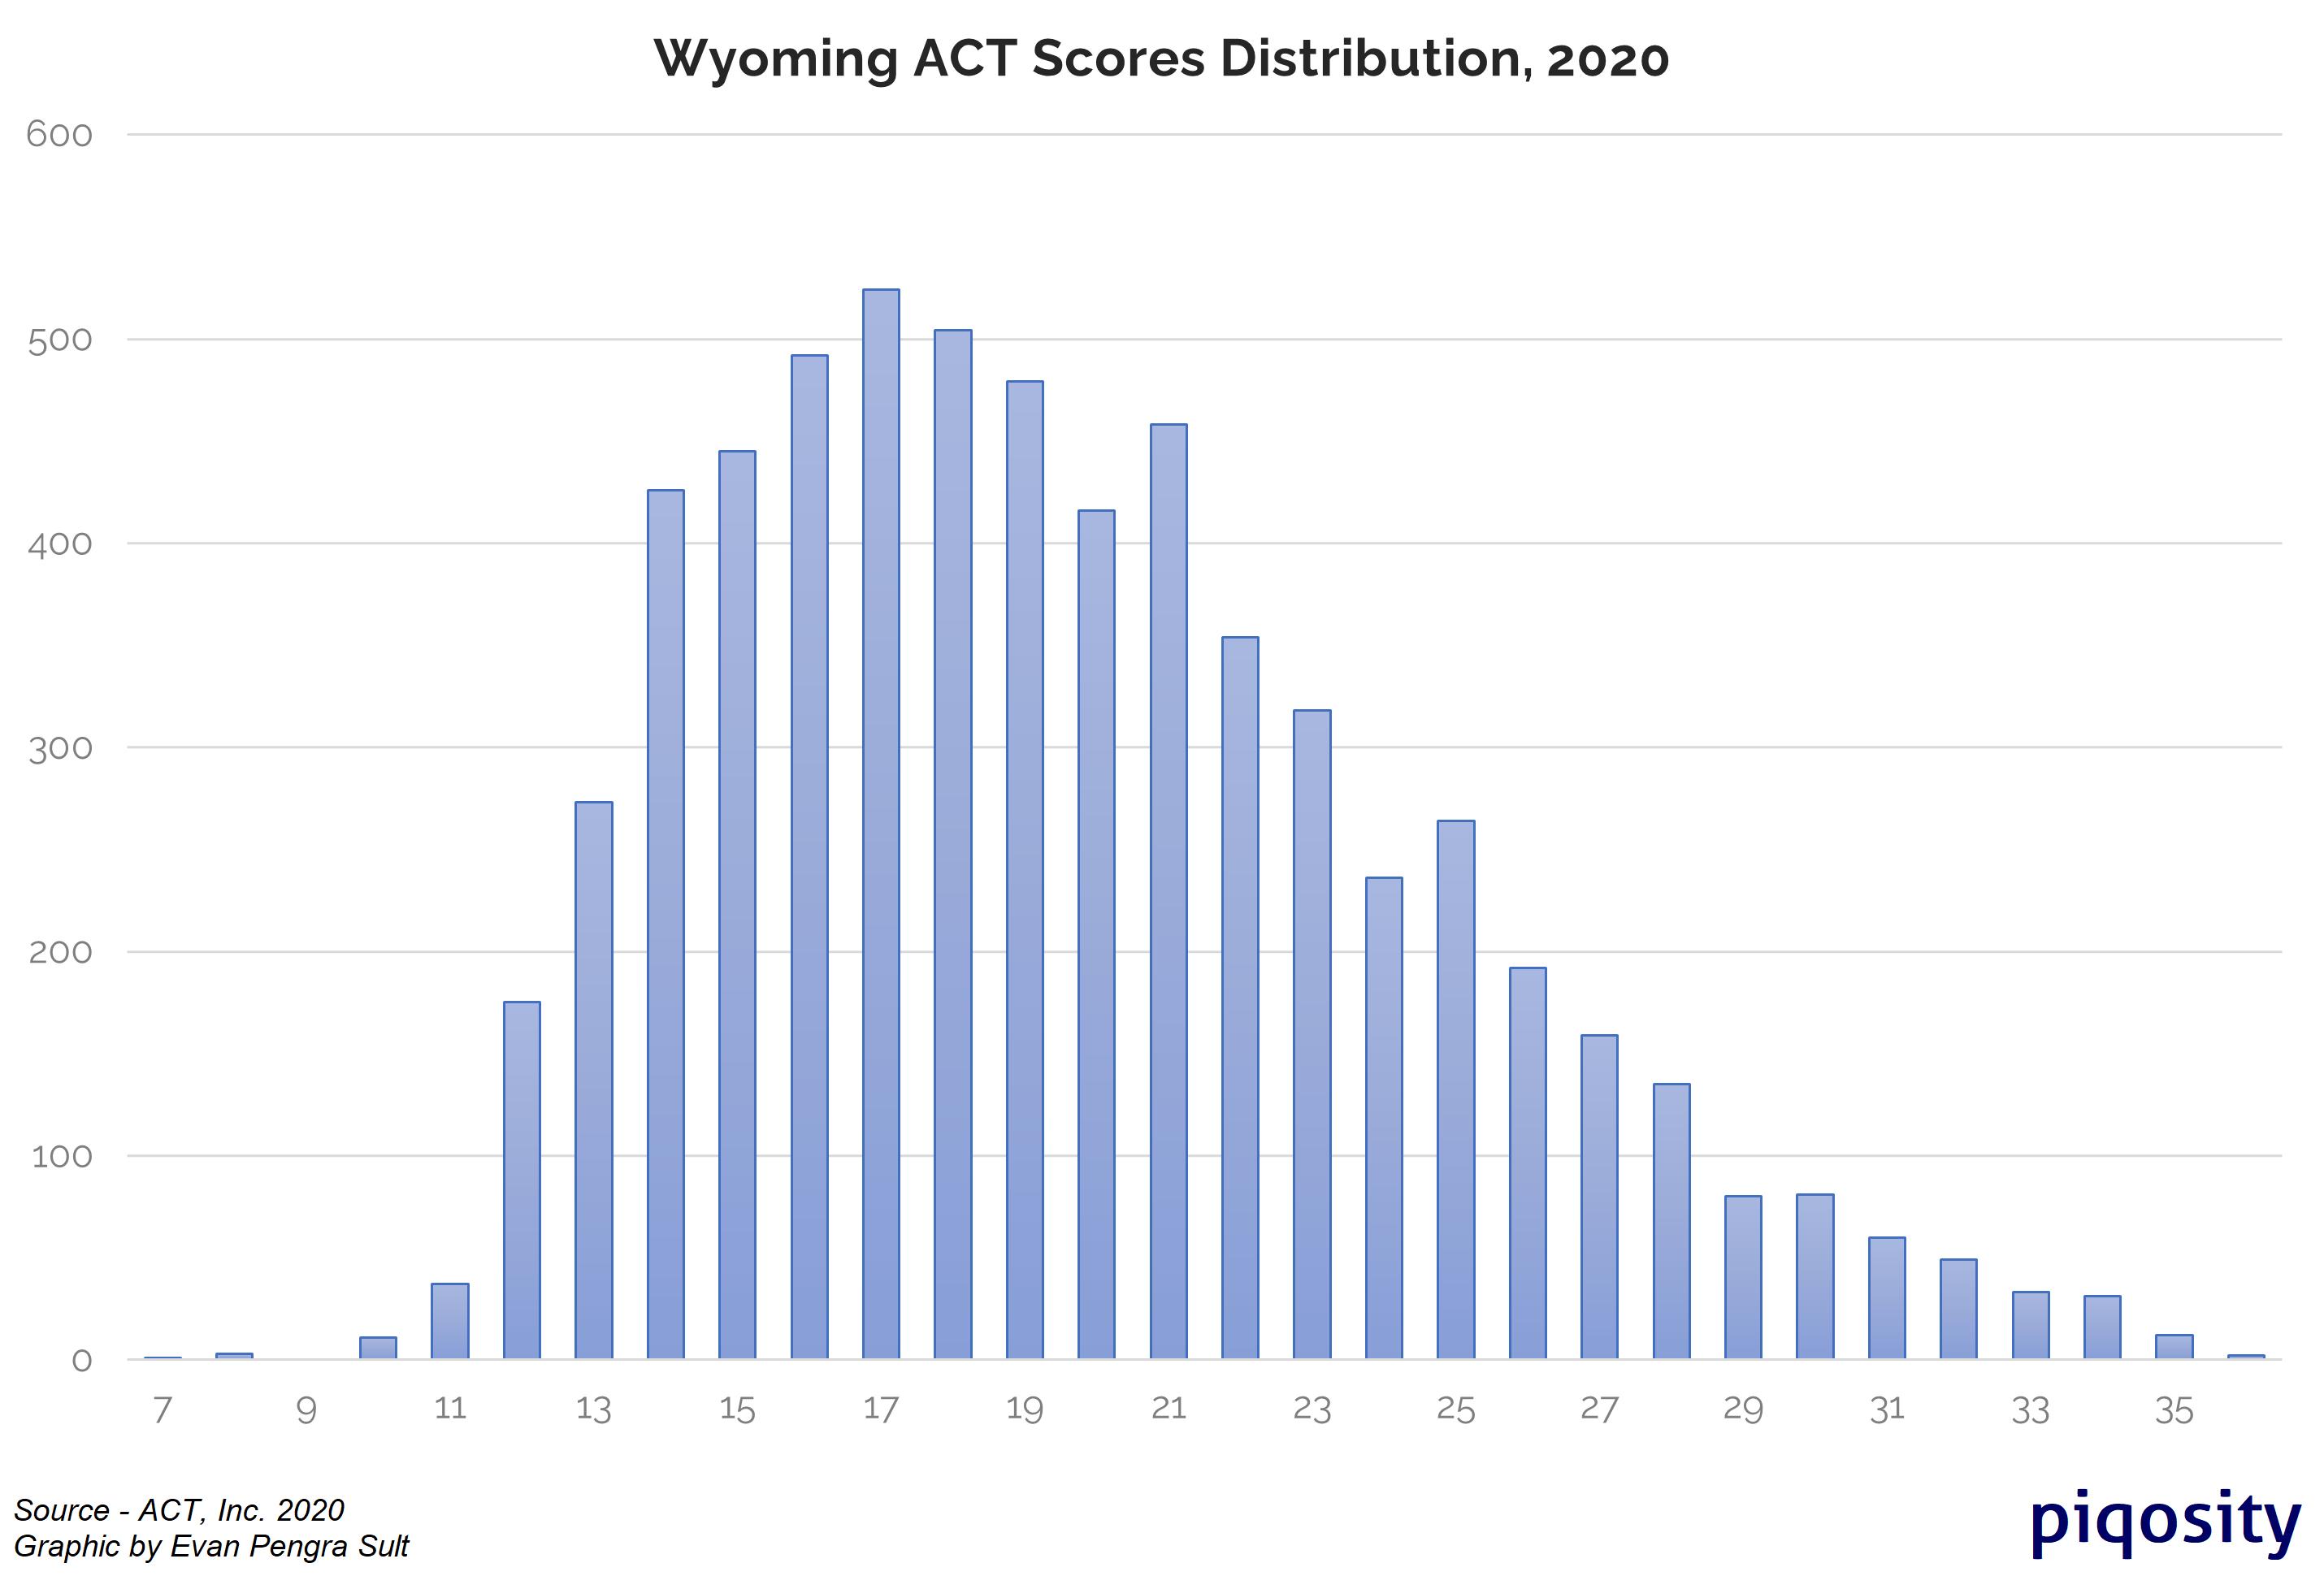 wyoming act scores distribution 2020